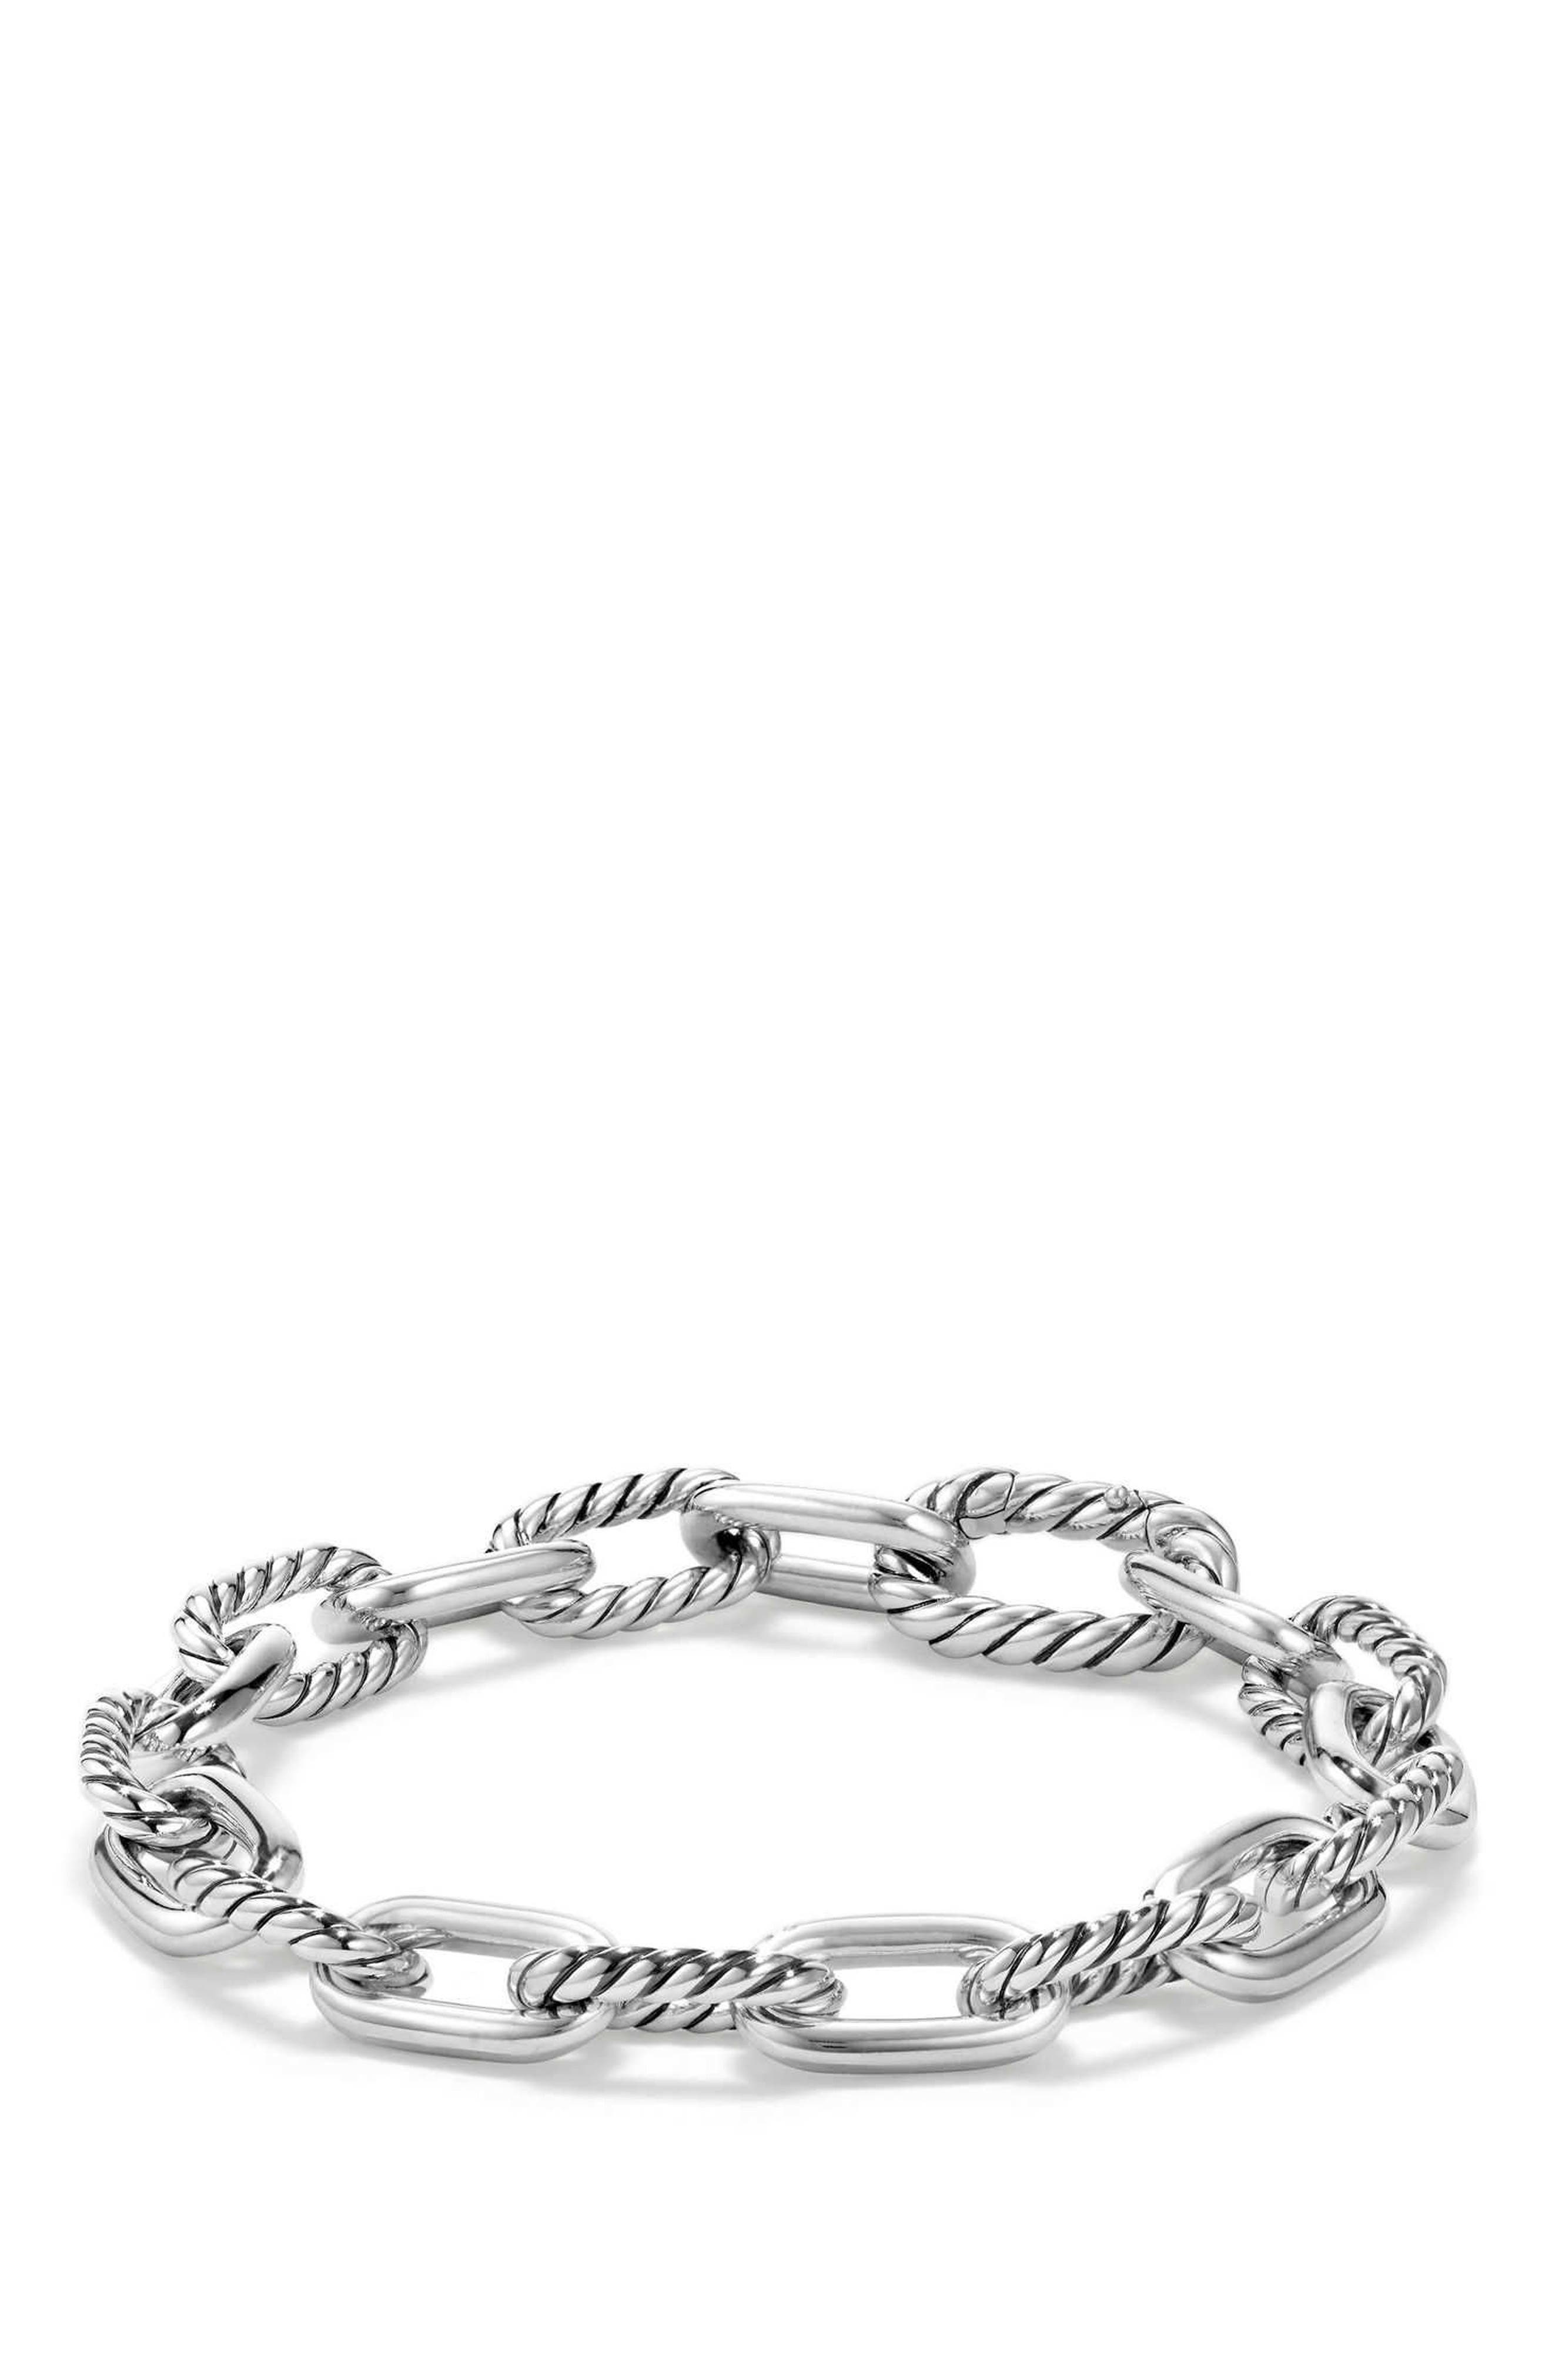 DAVID YURMAN DY Madison Chain Small Bracelet, Main, color, 040